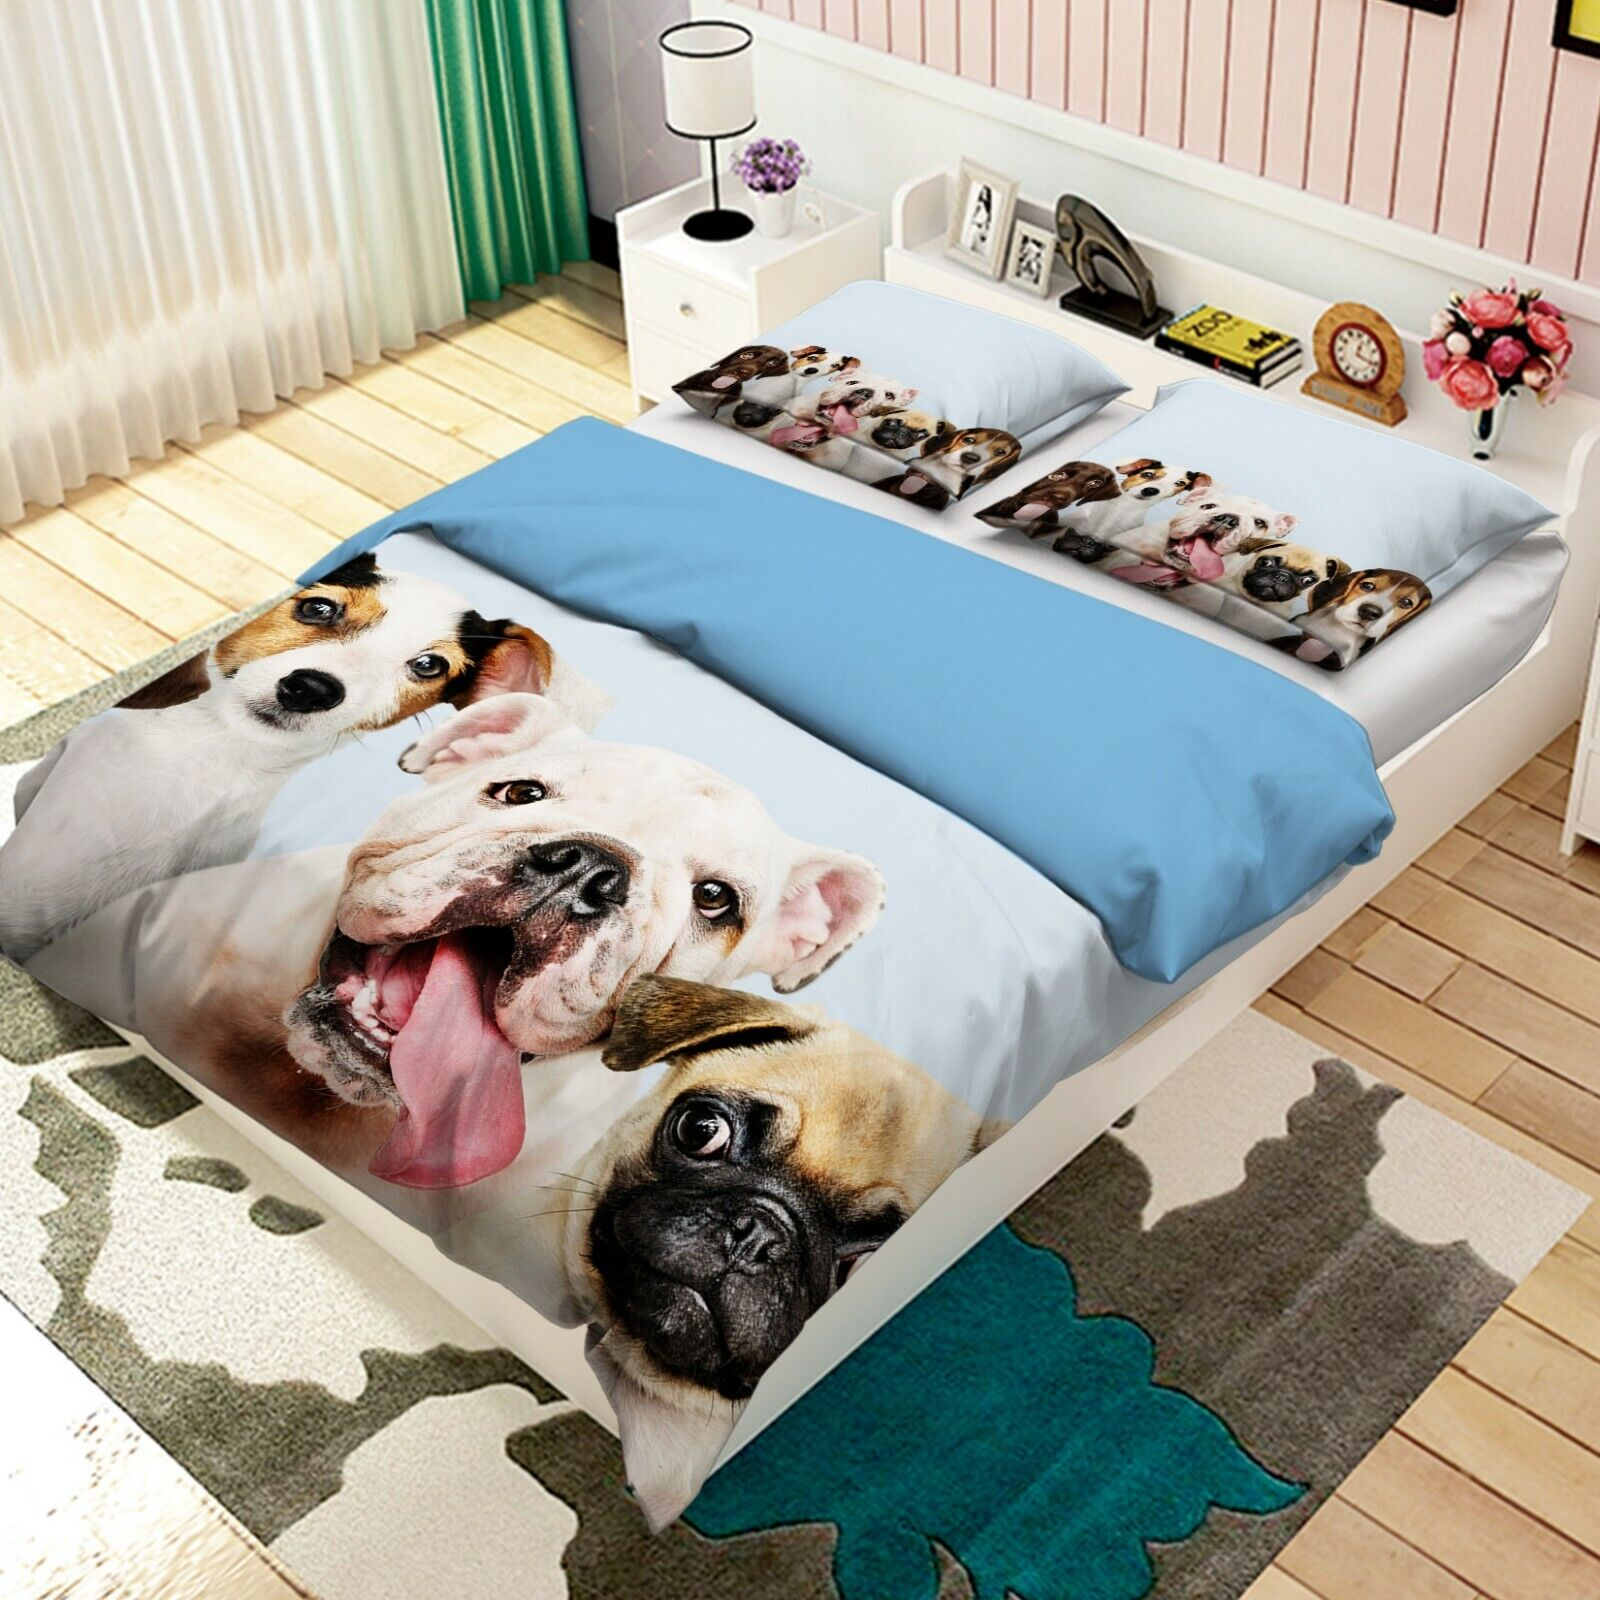 3D Cute Pet Hund I20 Animal Bett Pillowcases Quilt Duvet Startseite Königin König An